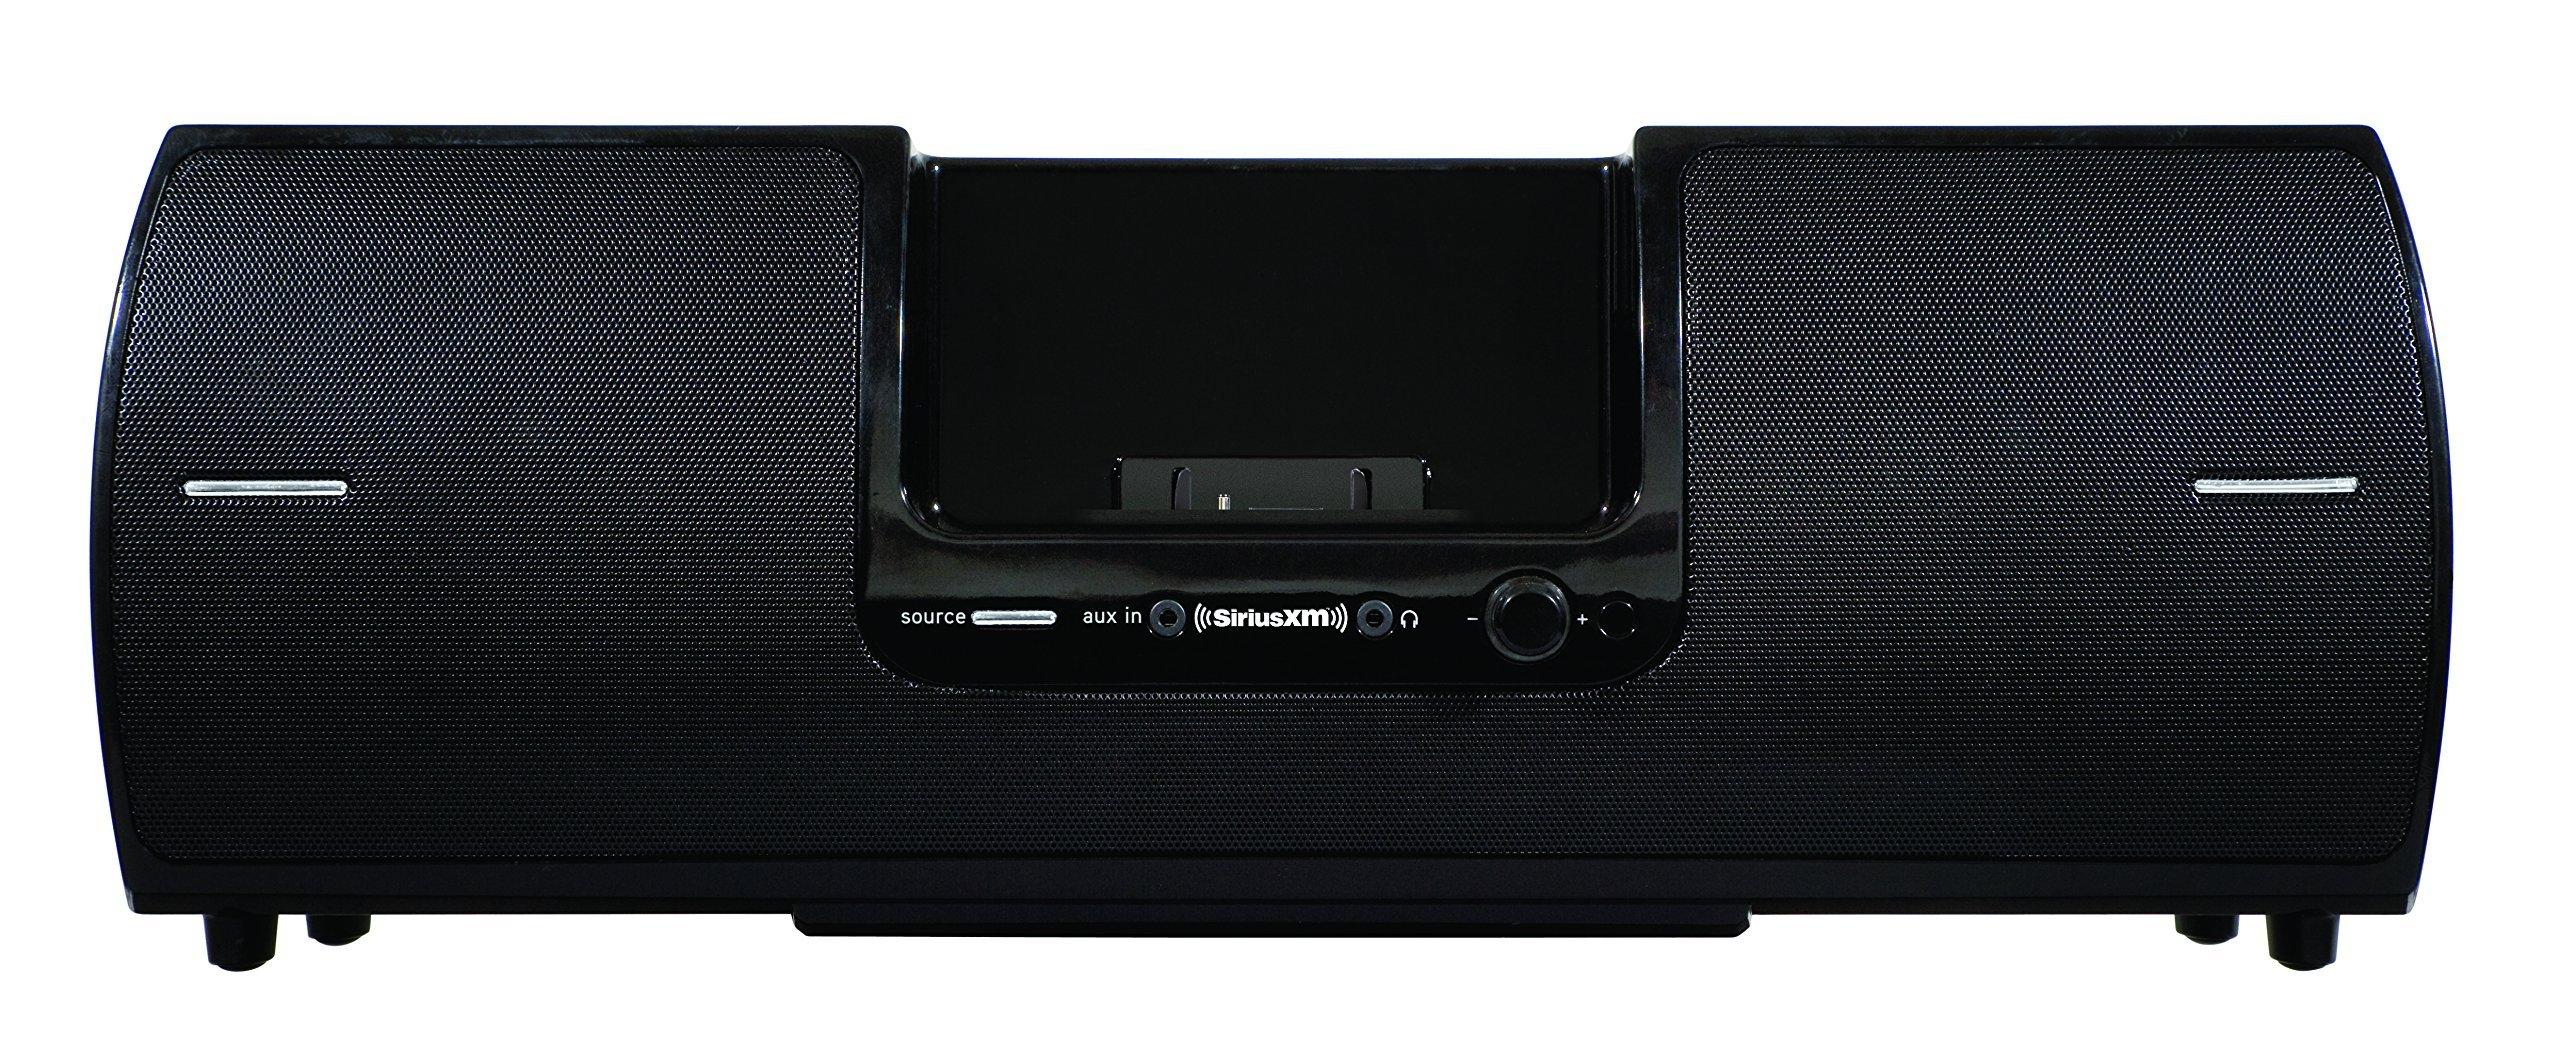 SiriusXM SXSD2 Portable Speaker Dock Audio System for Dock and Play Radios (Black) (Renewed) by SiriusXM